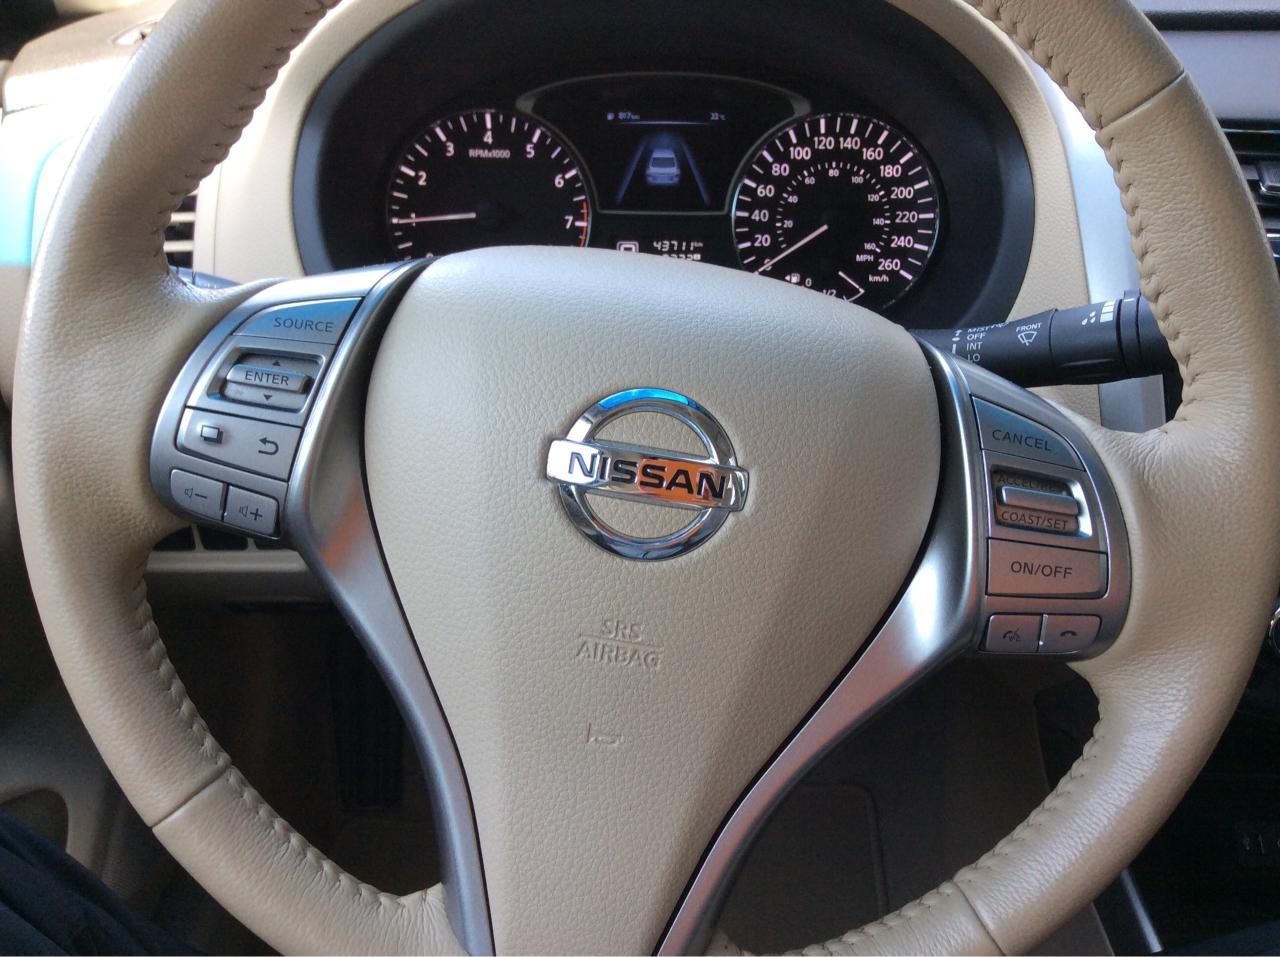 2014 Nissan Altima | Bluenose Motor Co Ltd